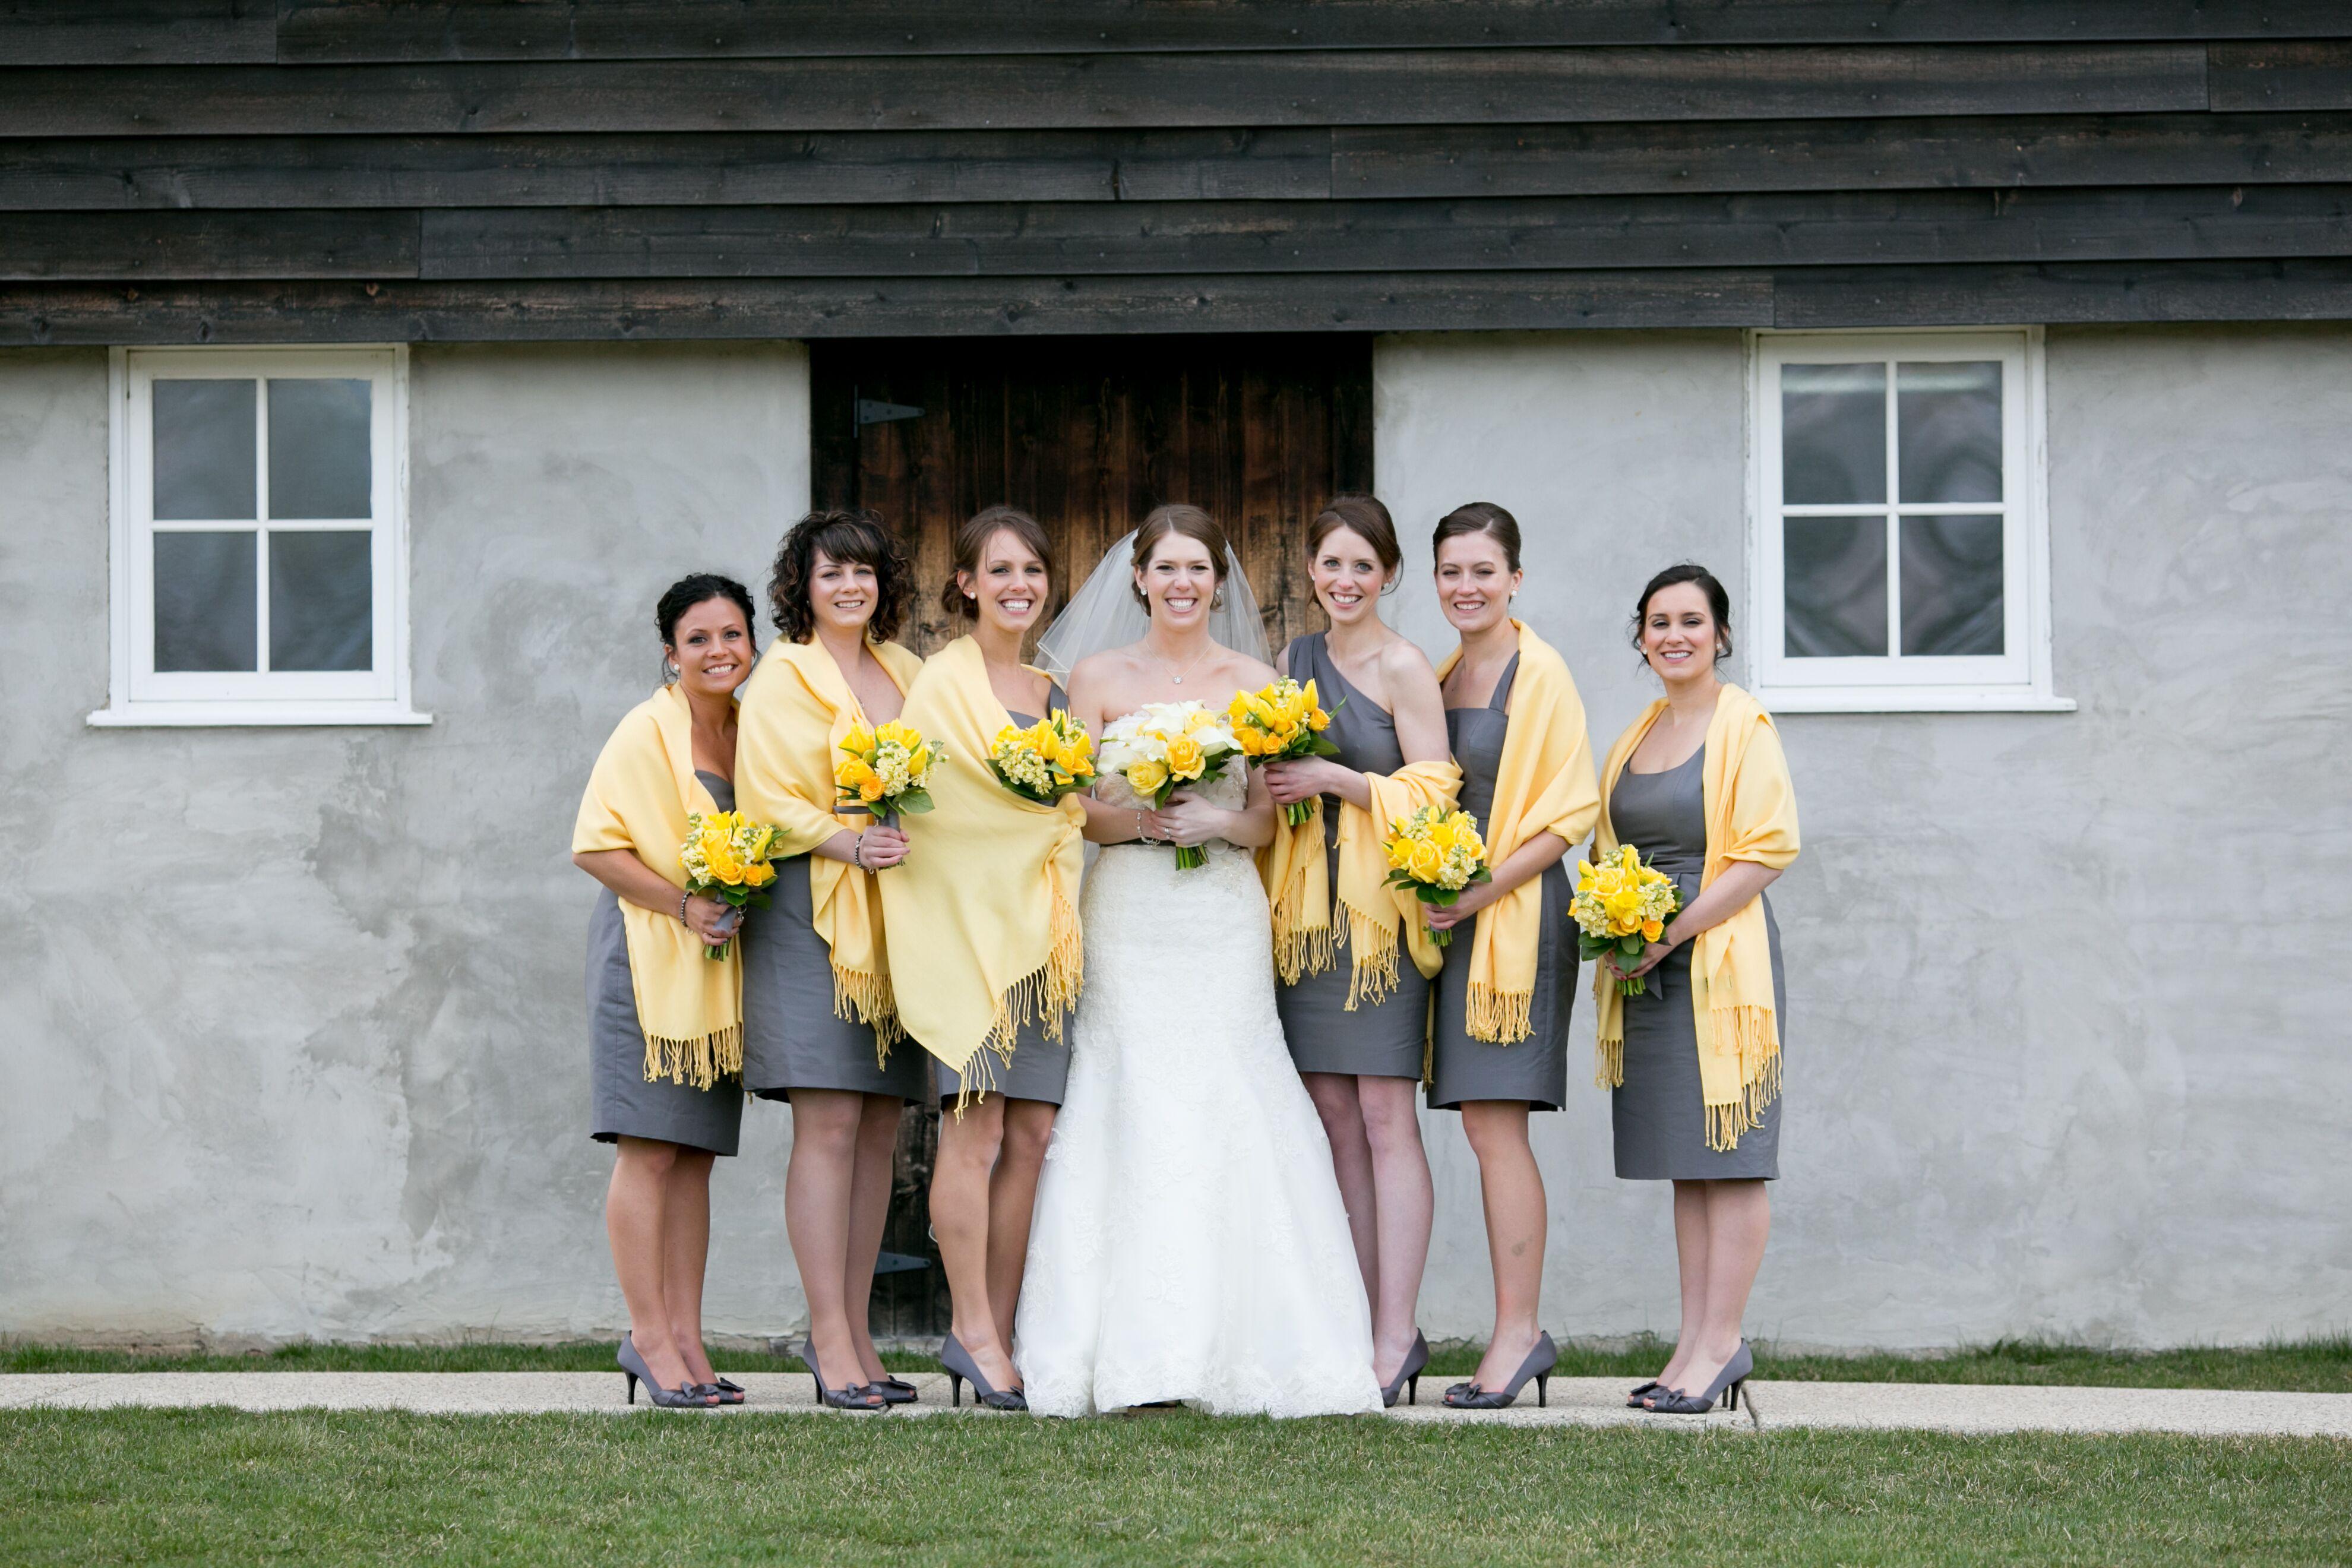 Gray J. Crew Bridesmaid Dresses With Yellow Shawls